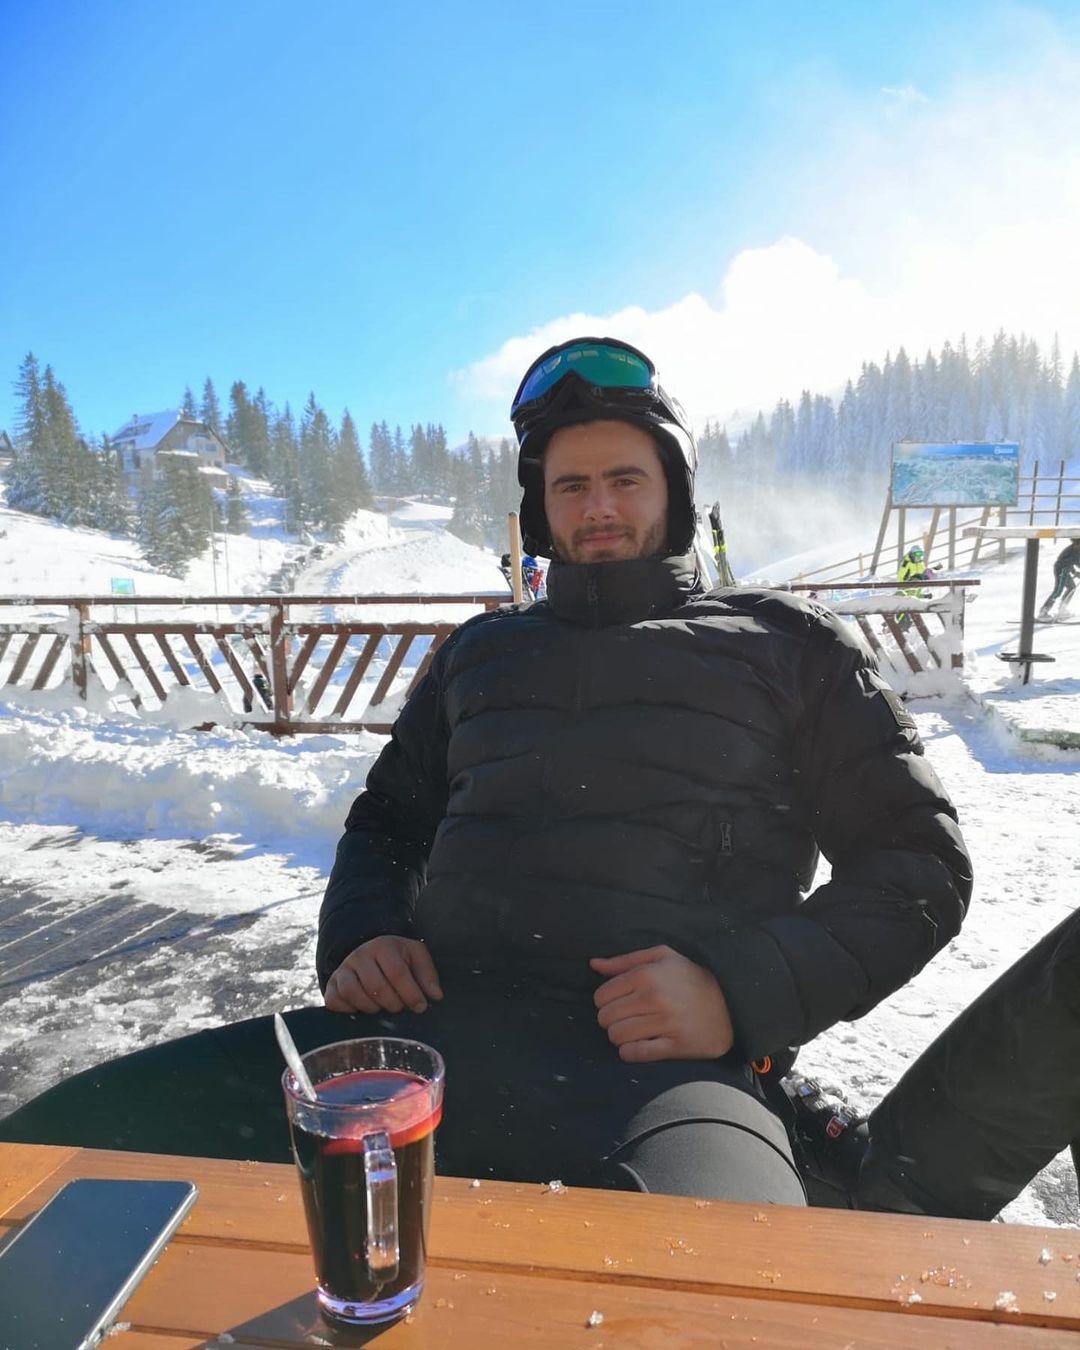 menikmati winter cafe jahorina bosnia herzegovina